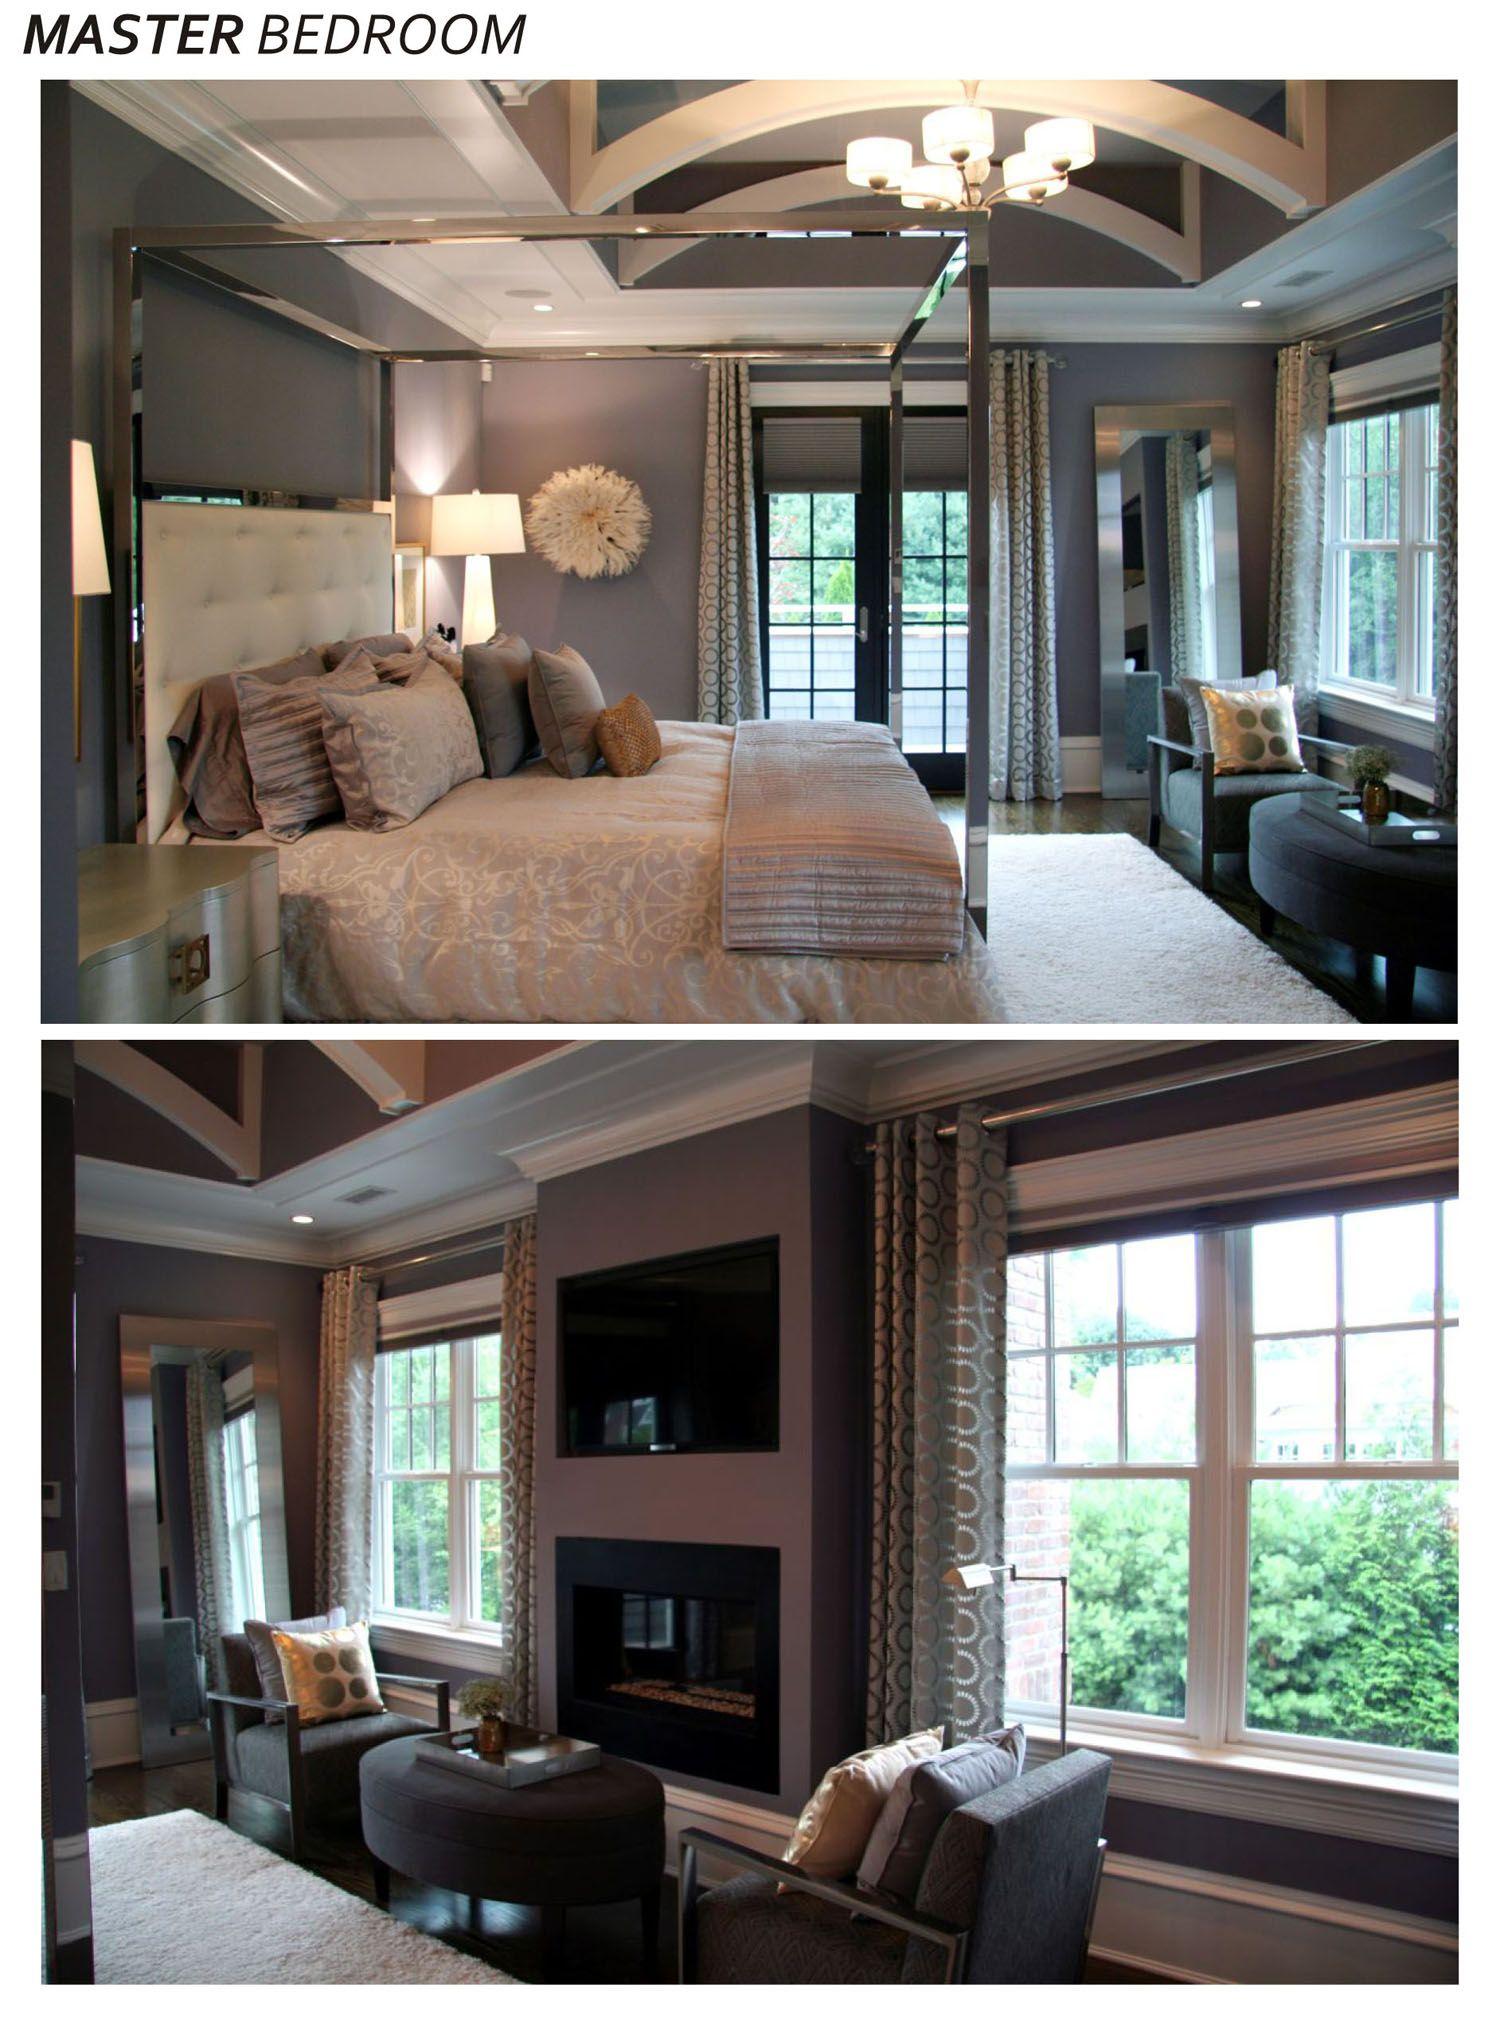 Greenwich ct master bedroom collaborative work of sew fine and hom interiors interiordesign also rh pinterest